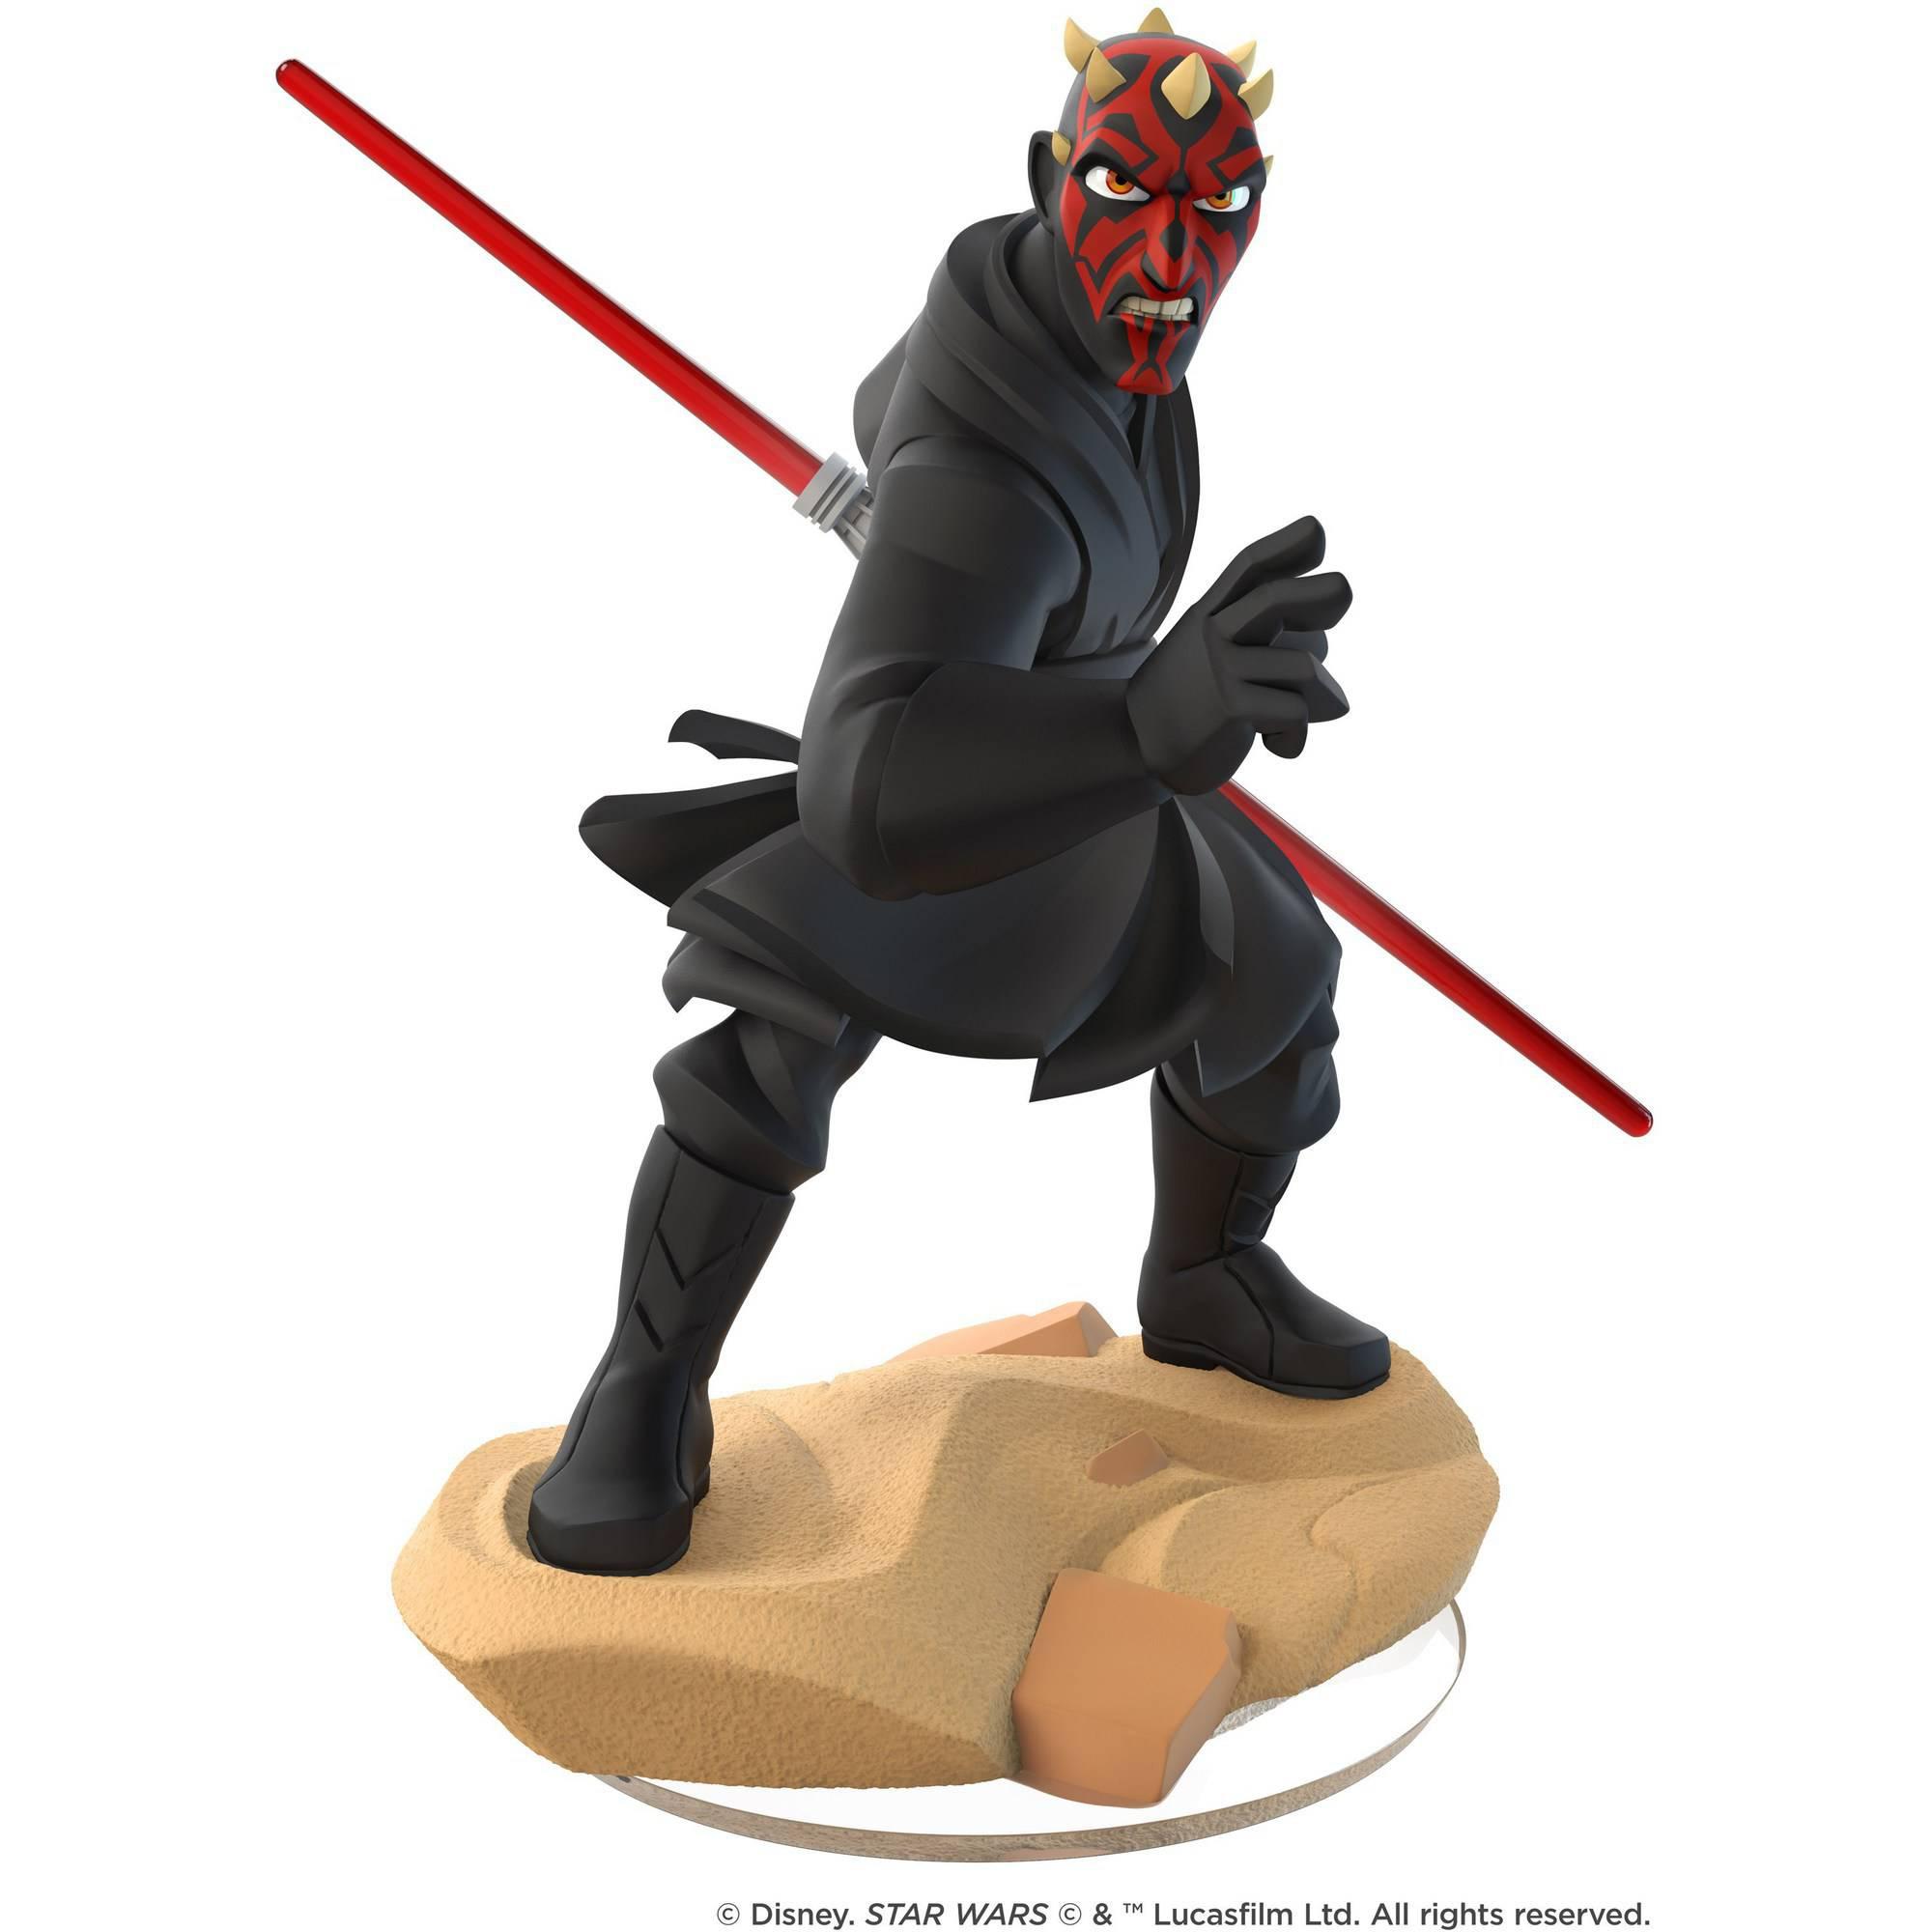 Disney Infinity 3.0 Star Wars Darth Maul /hibás/